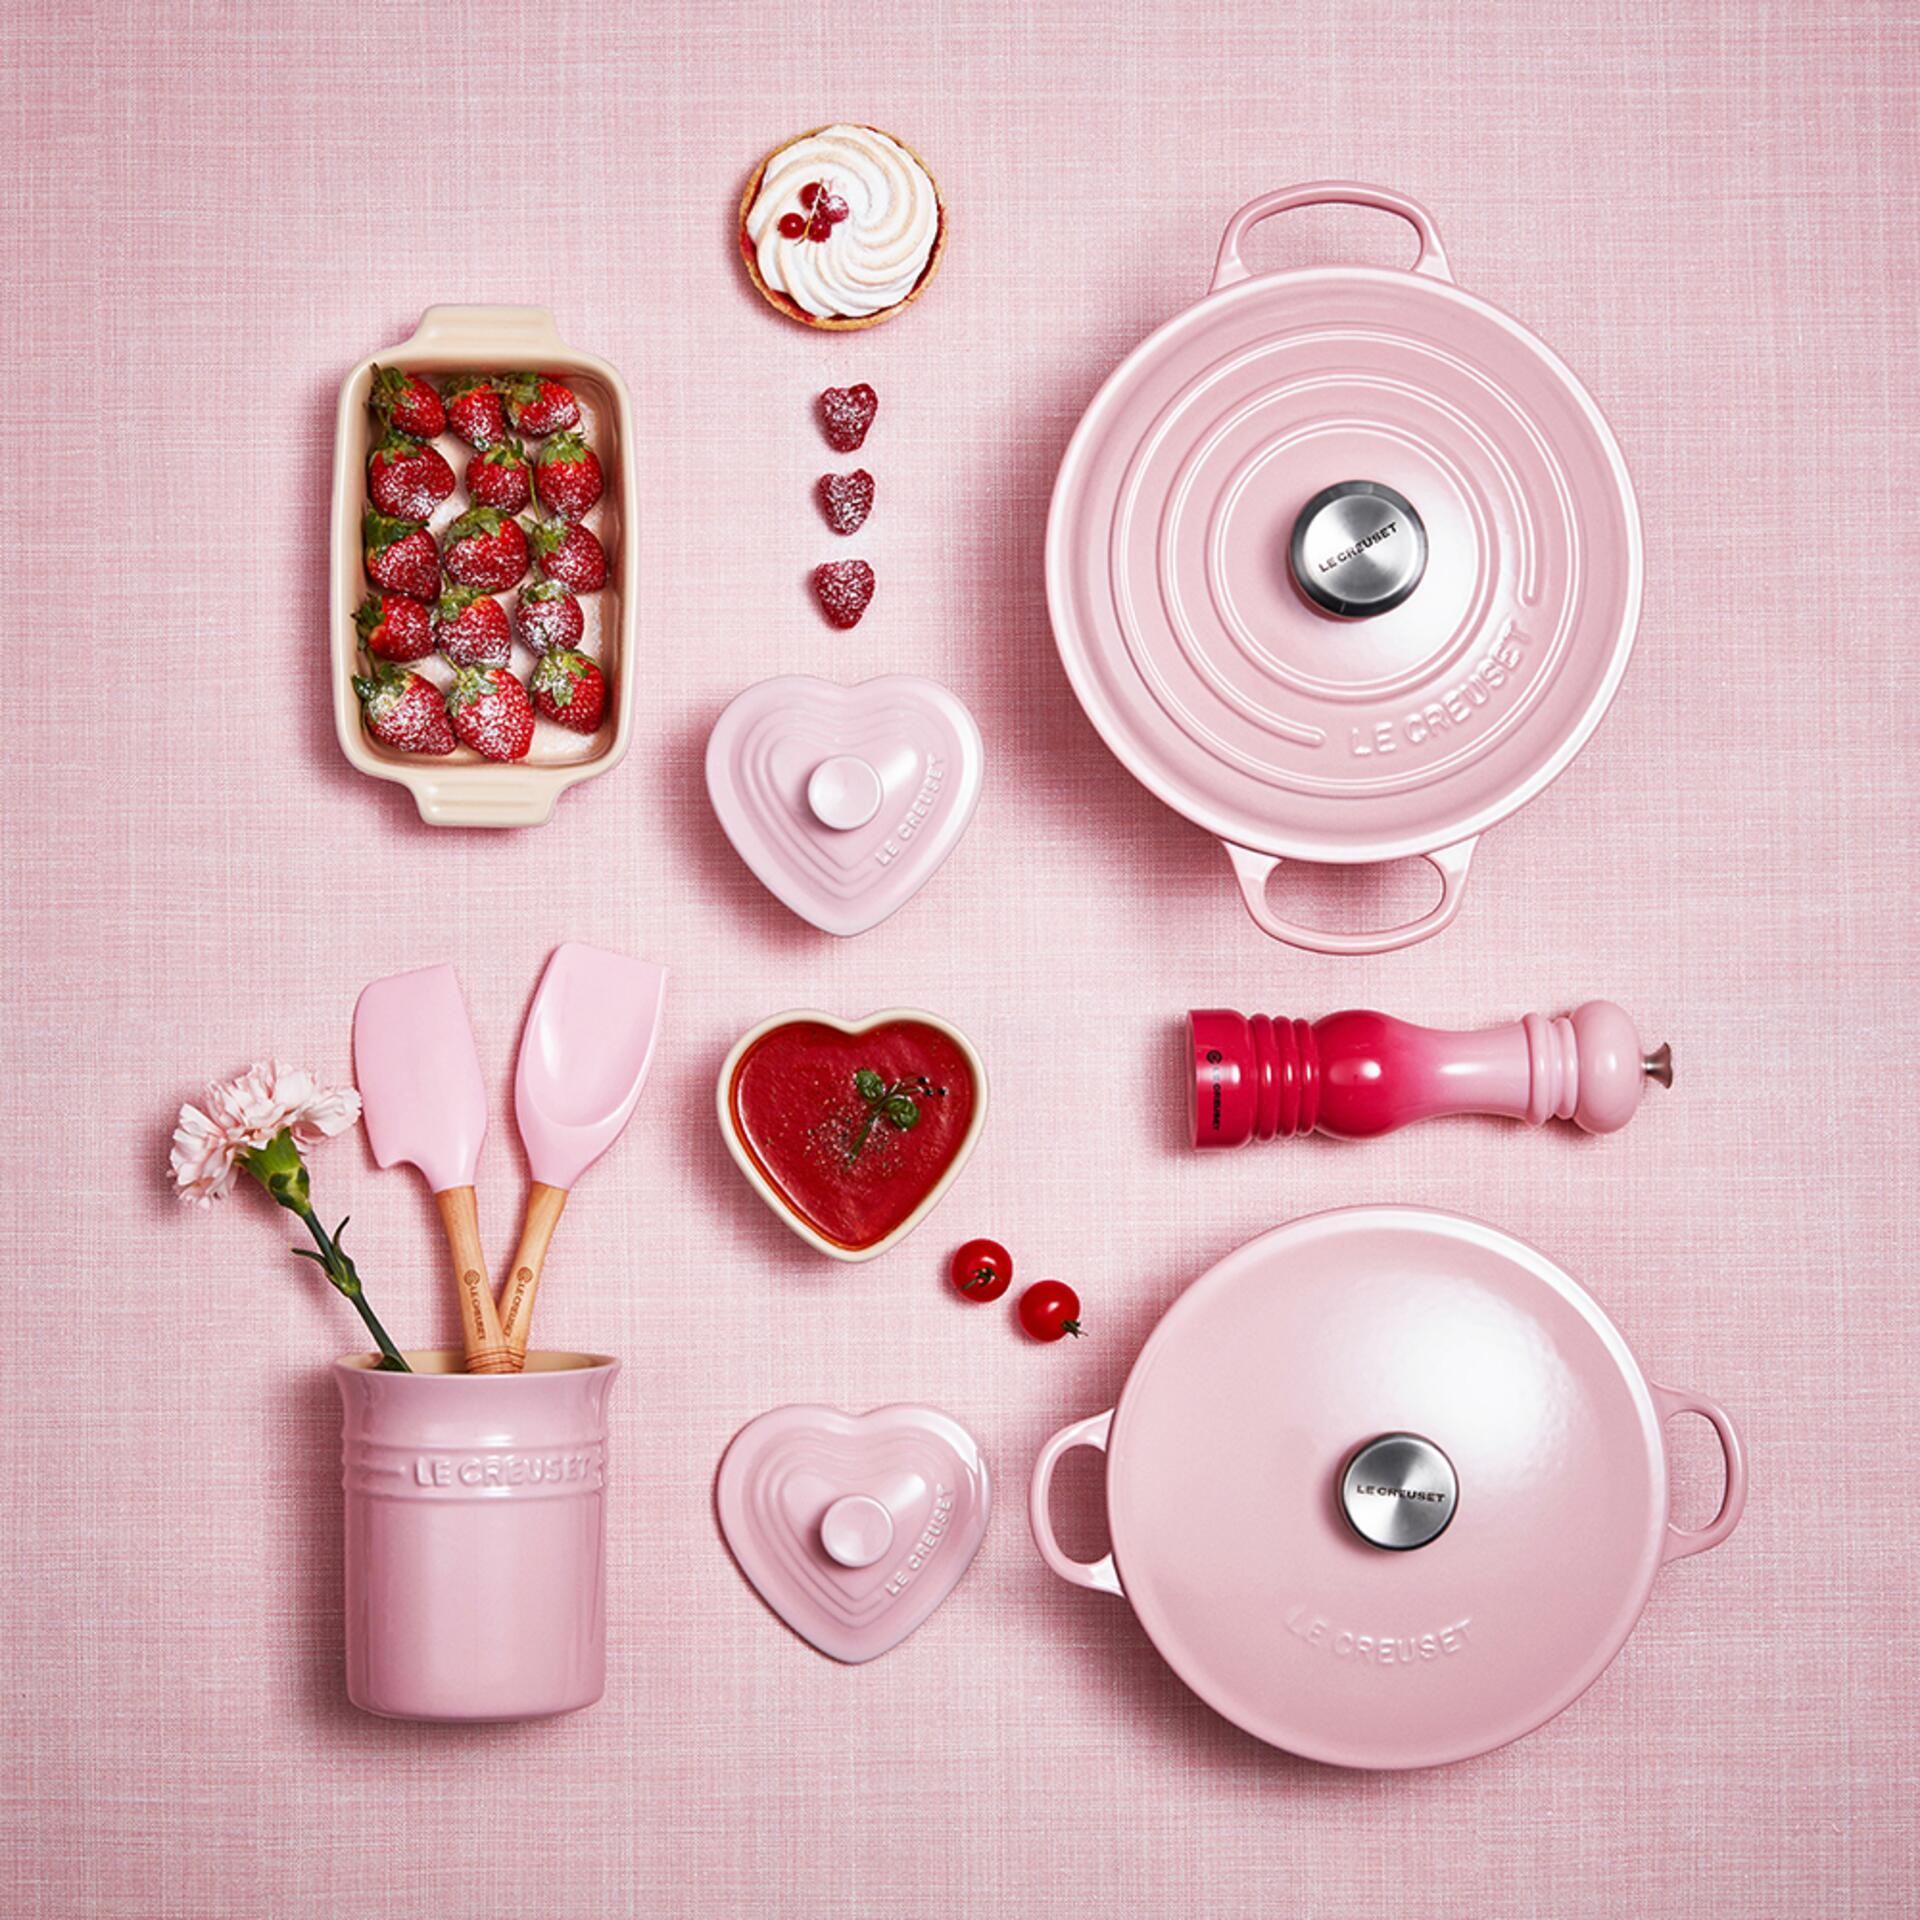 Le Creuset Auflaufform 13 x 19 cm Chiffon Pink